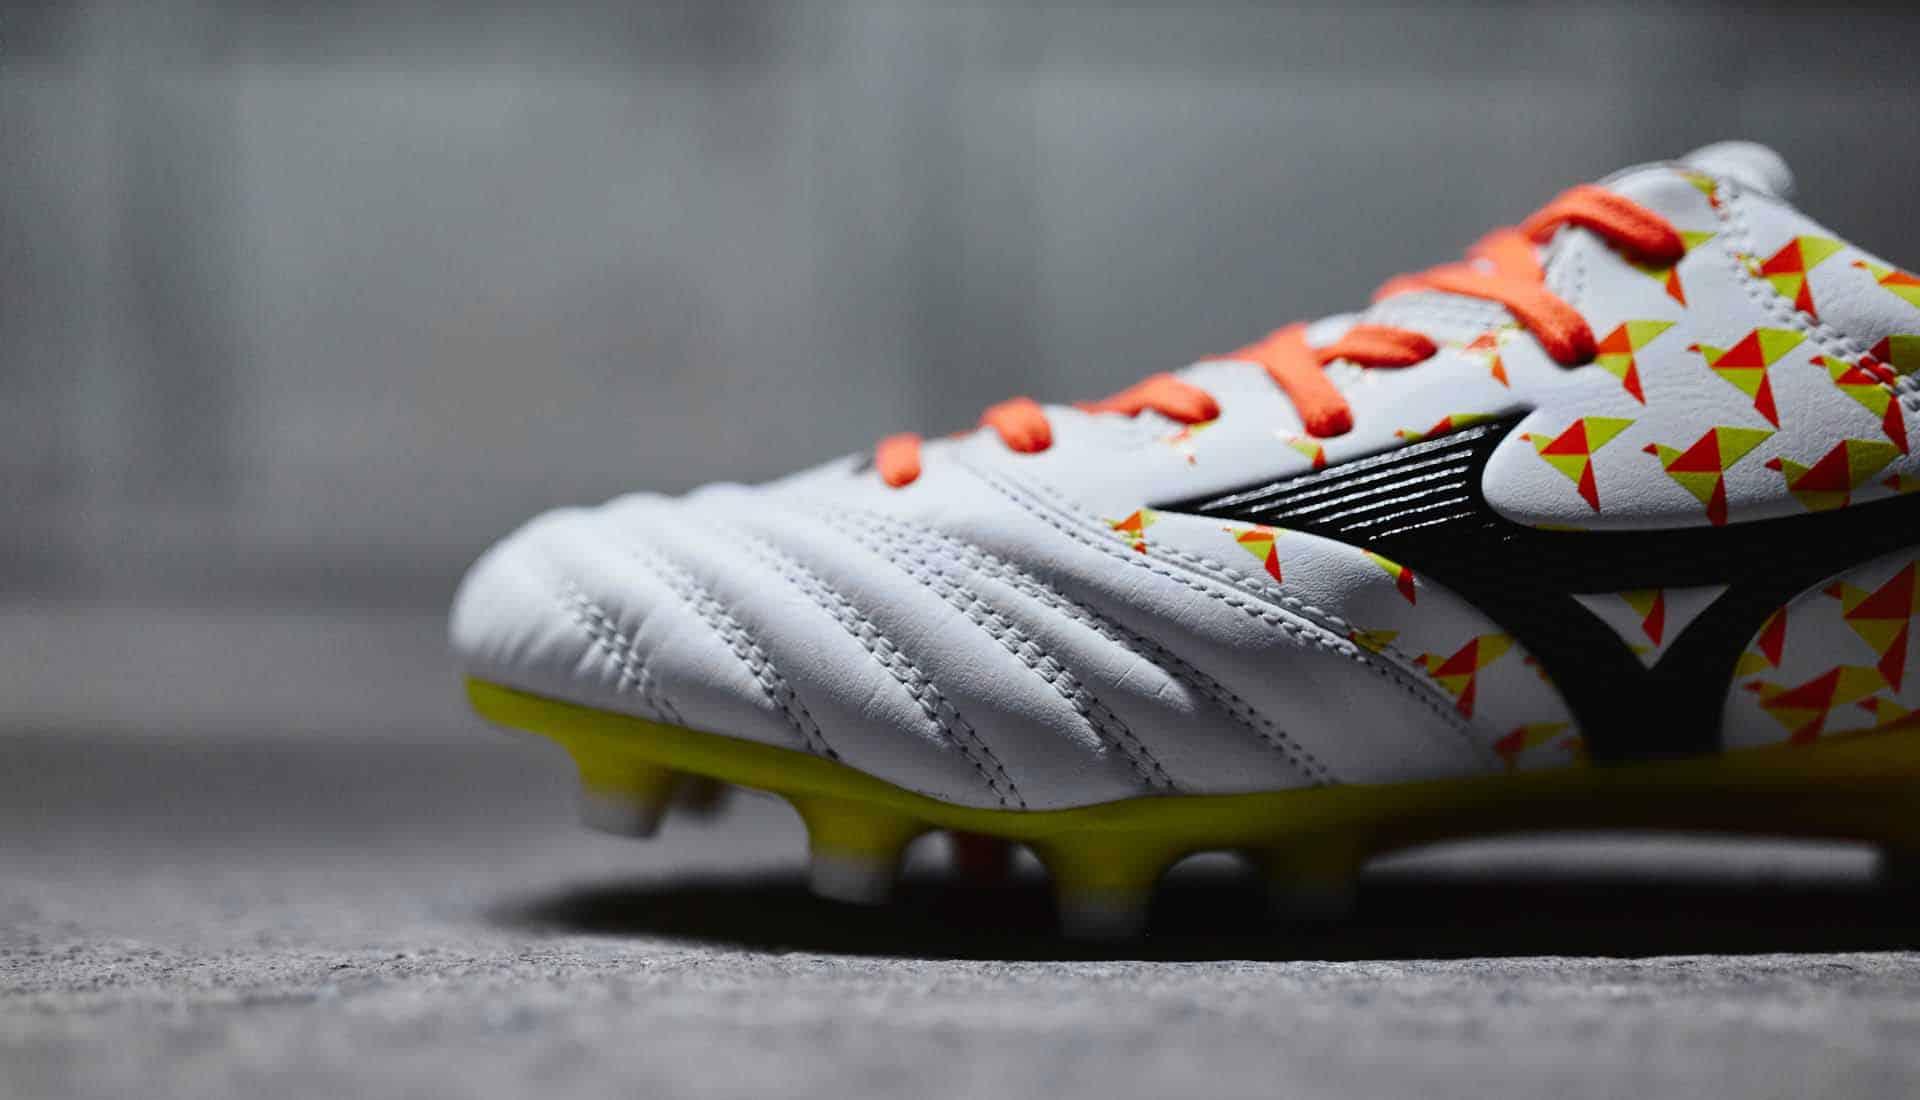 chaussures-football-Mizuno-Morelia-Neo-Origami-blanc-orange-jaune-img1